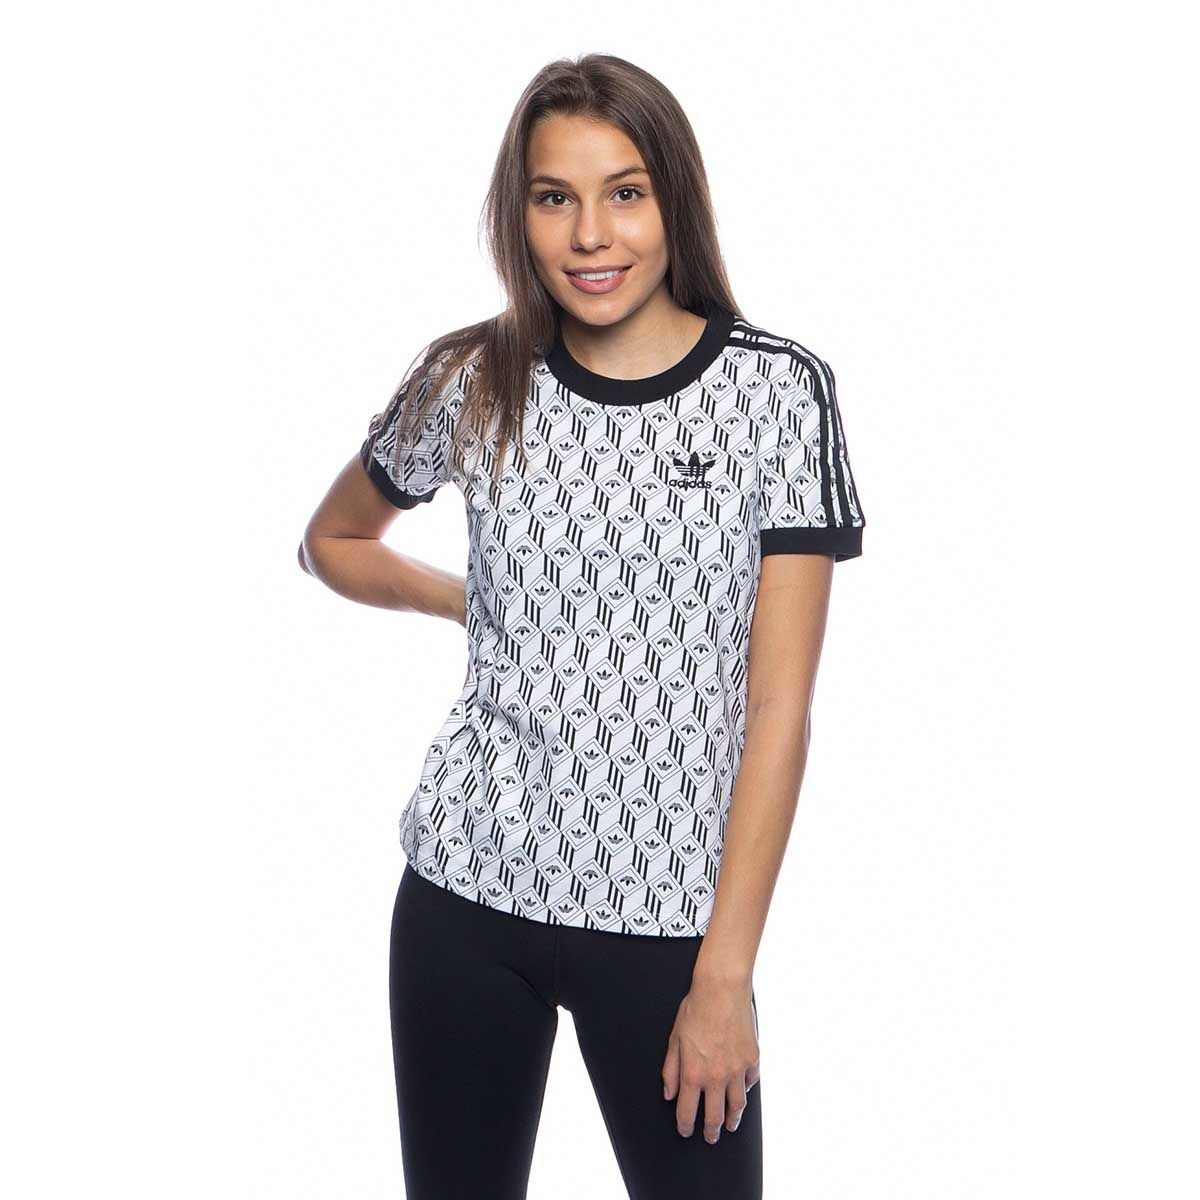 Koszulka damska Adidas Originals 3 Stripes Tee black